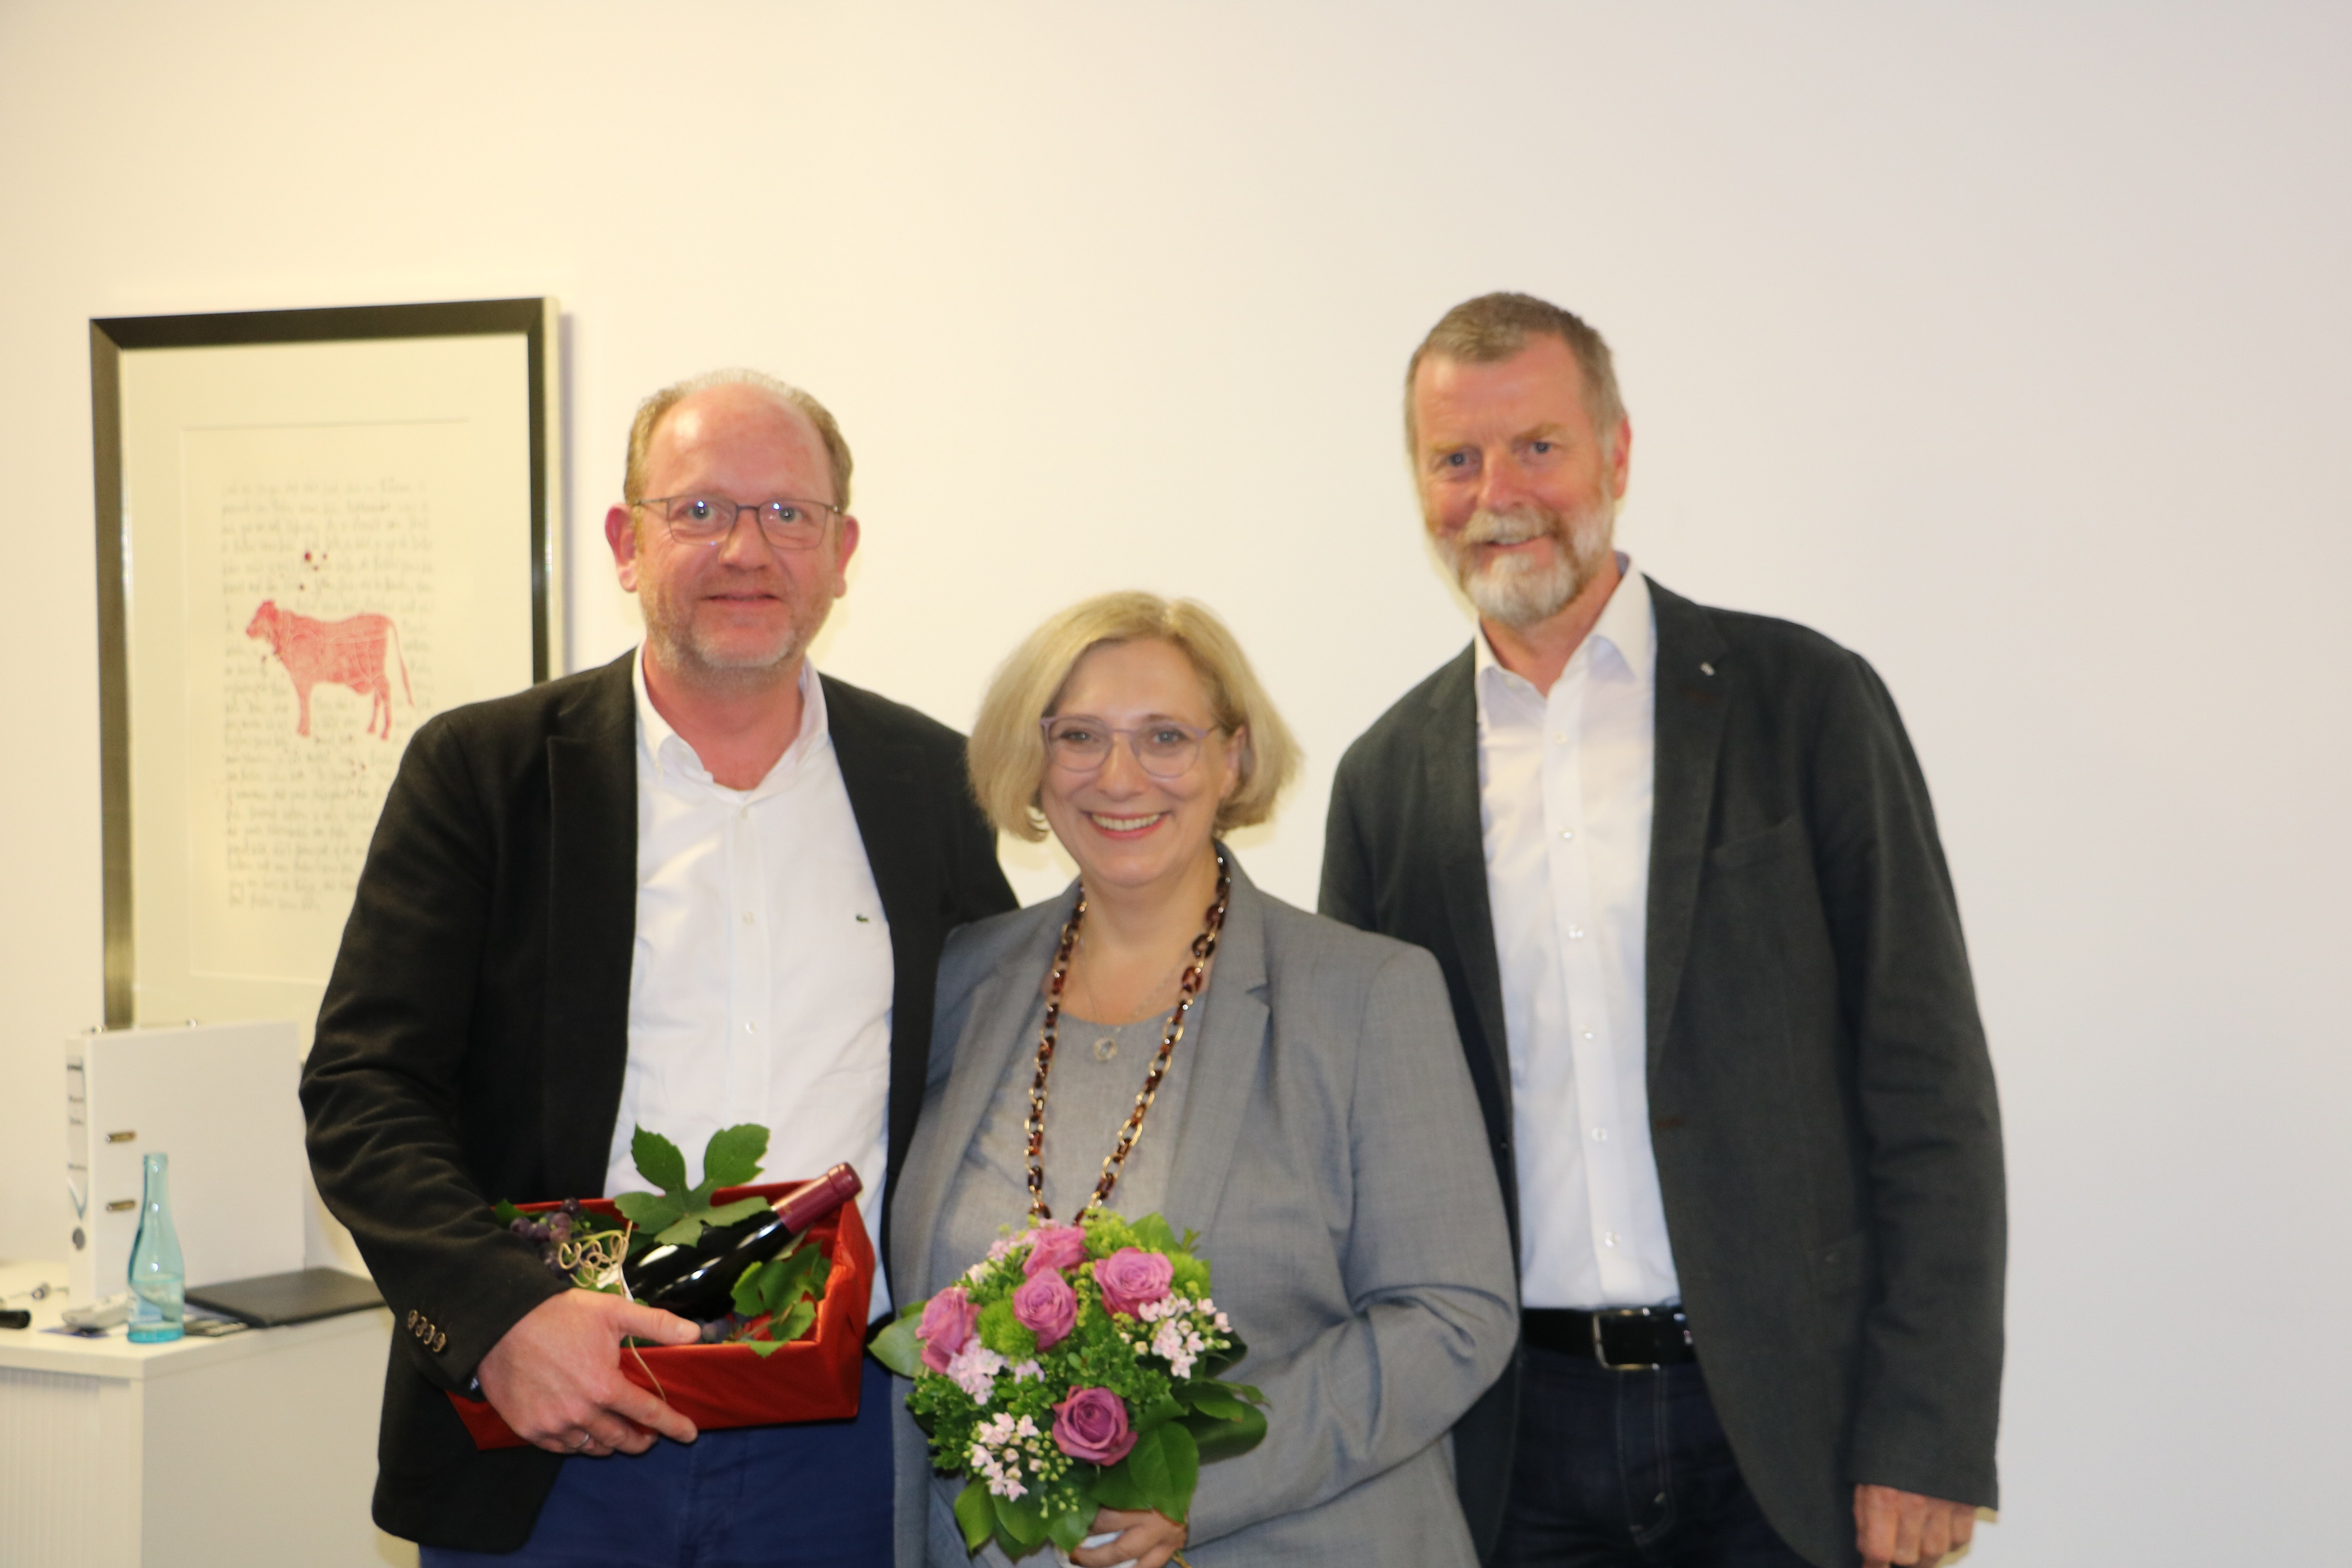 Geschäftsführer Wolfgang Paus, Dr. Daniela De Ridder und SPD-Ortsvereinsvorsitzender Hugo Kirchhelle